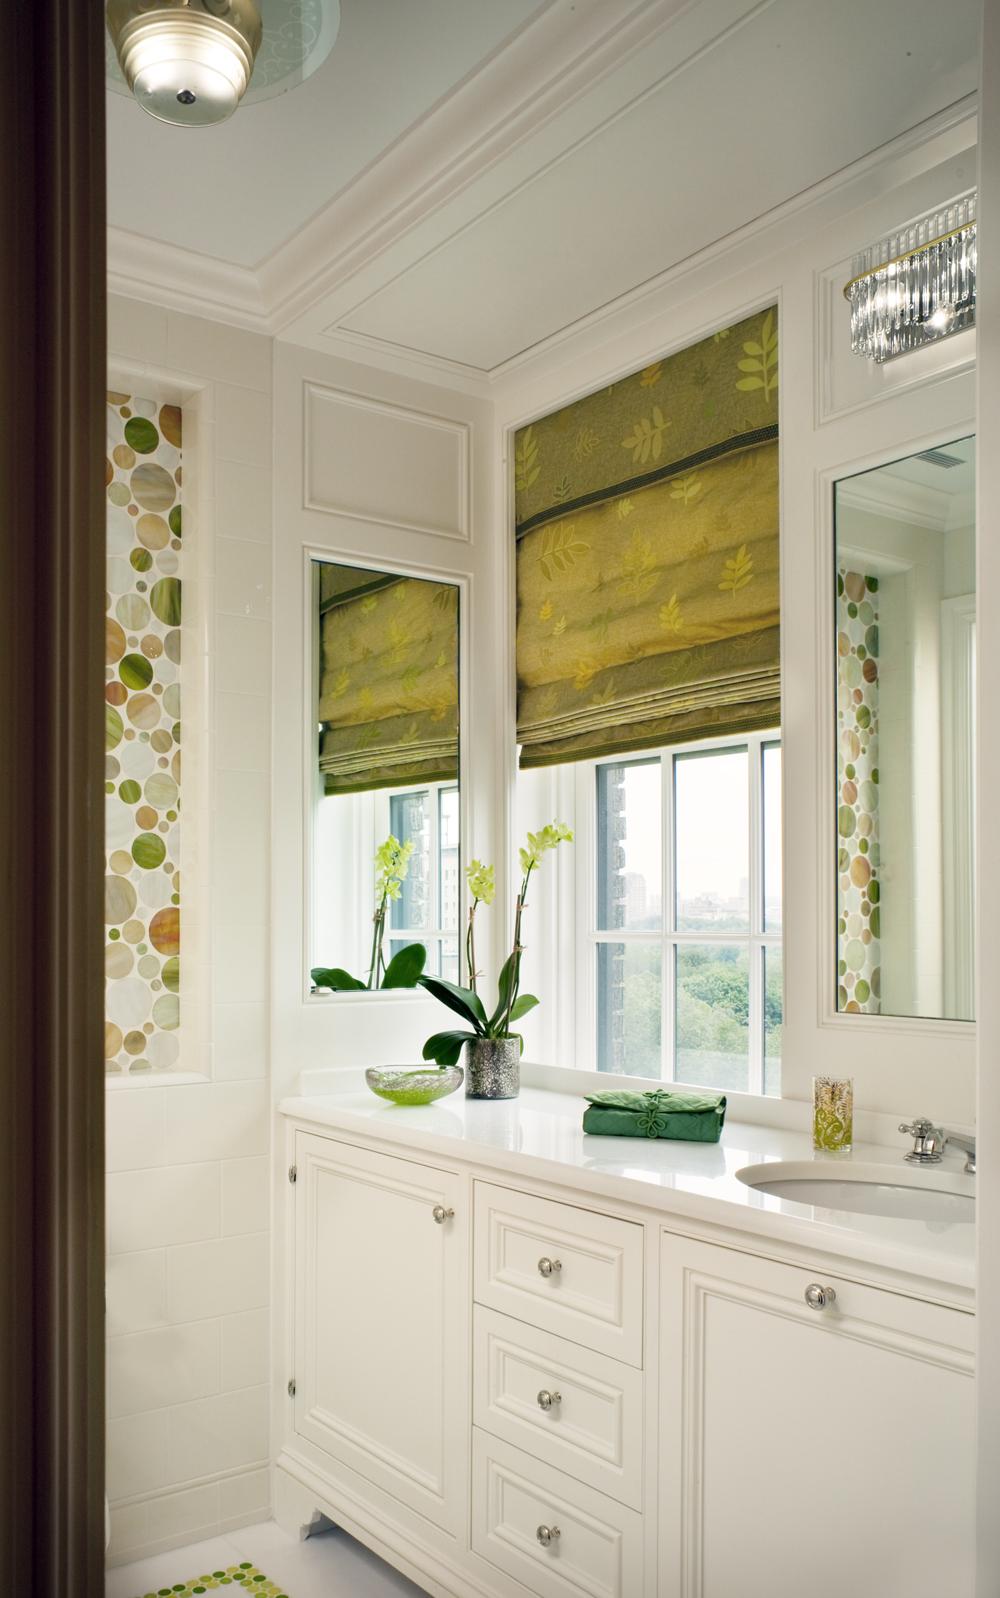 LSI-web-fifth-ave-interior-bathroom-3.jpg